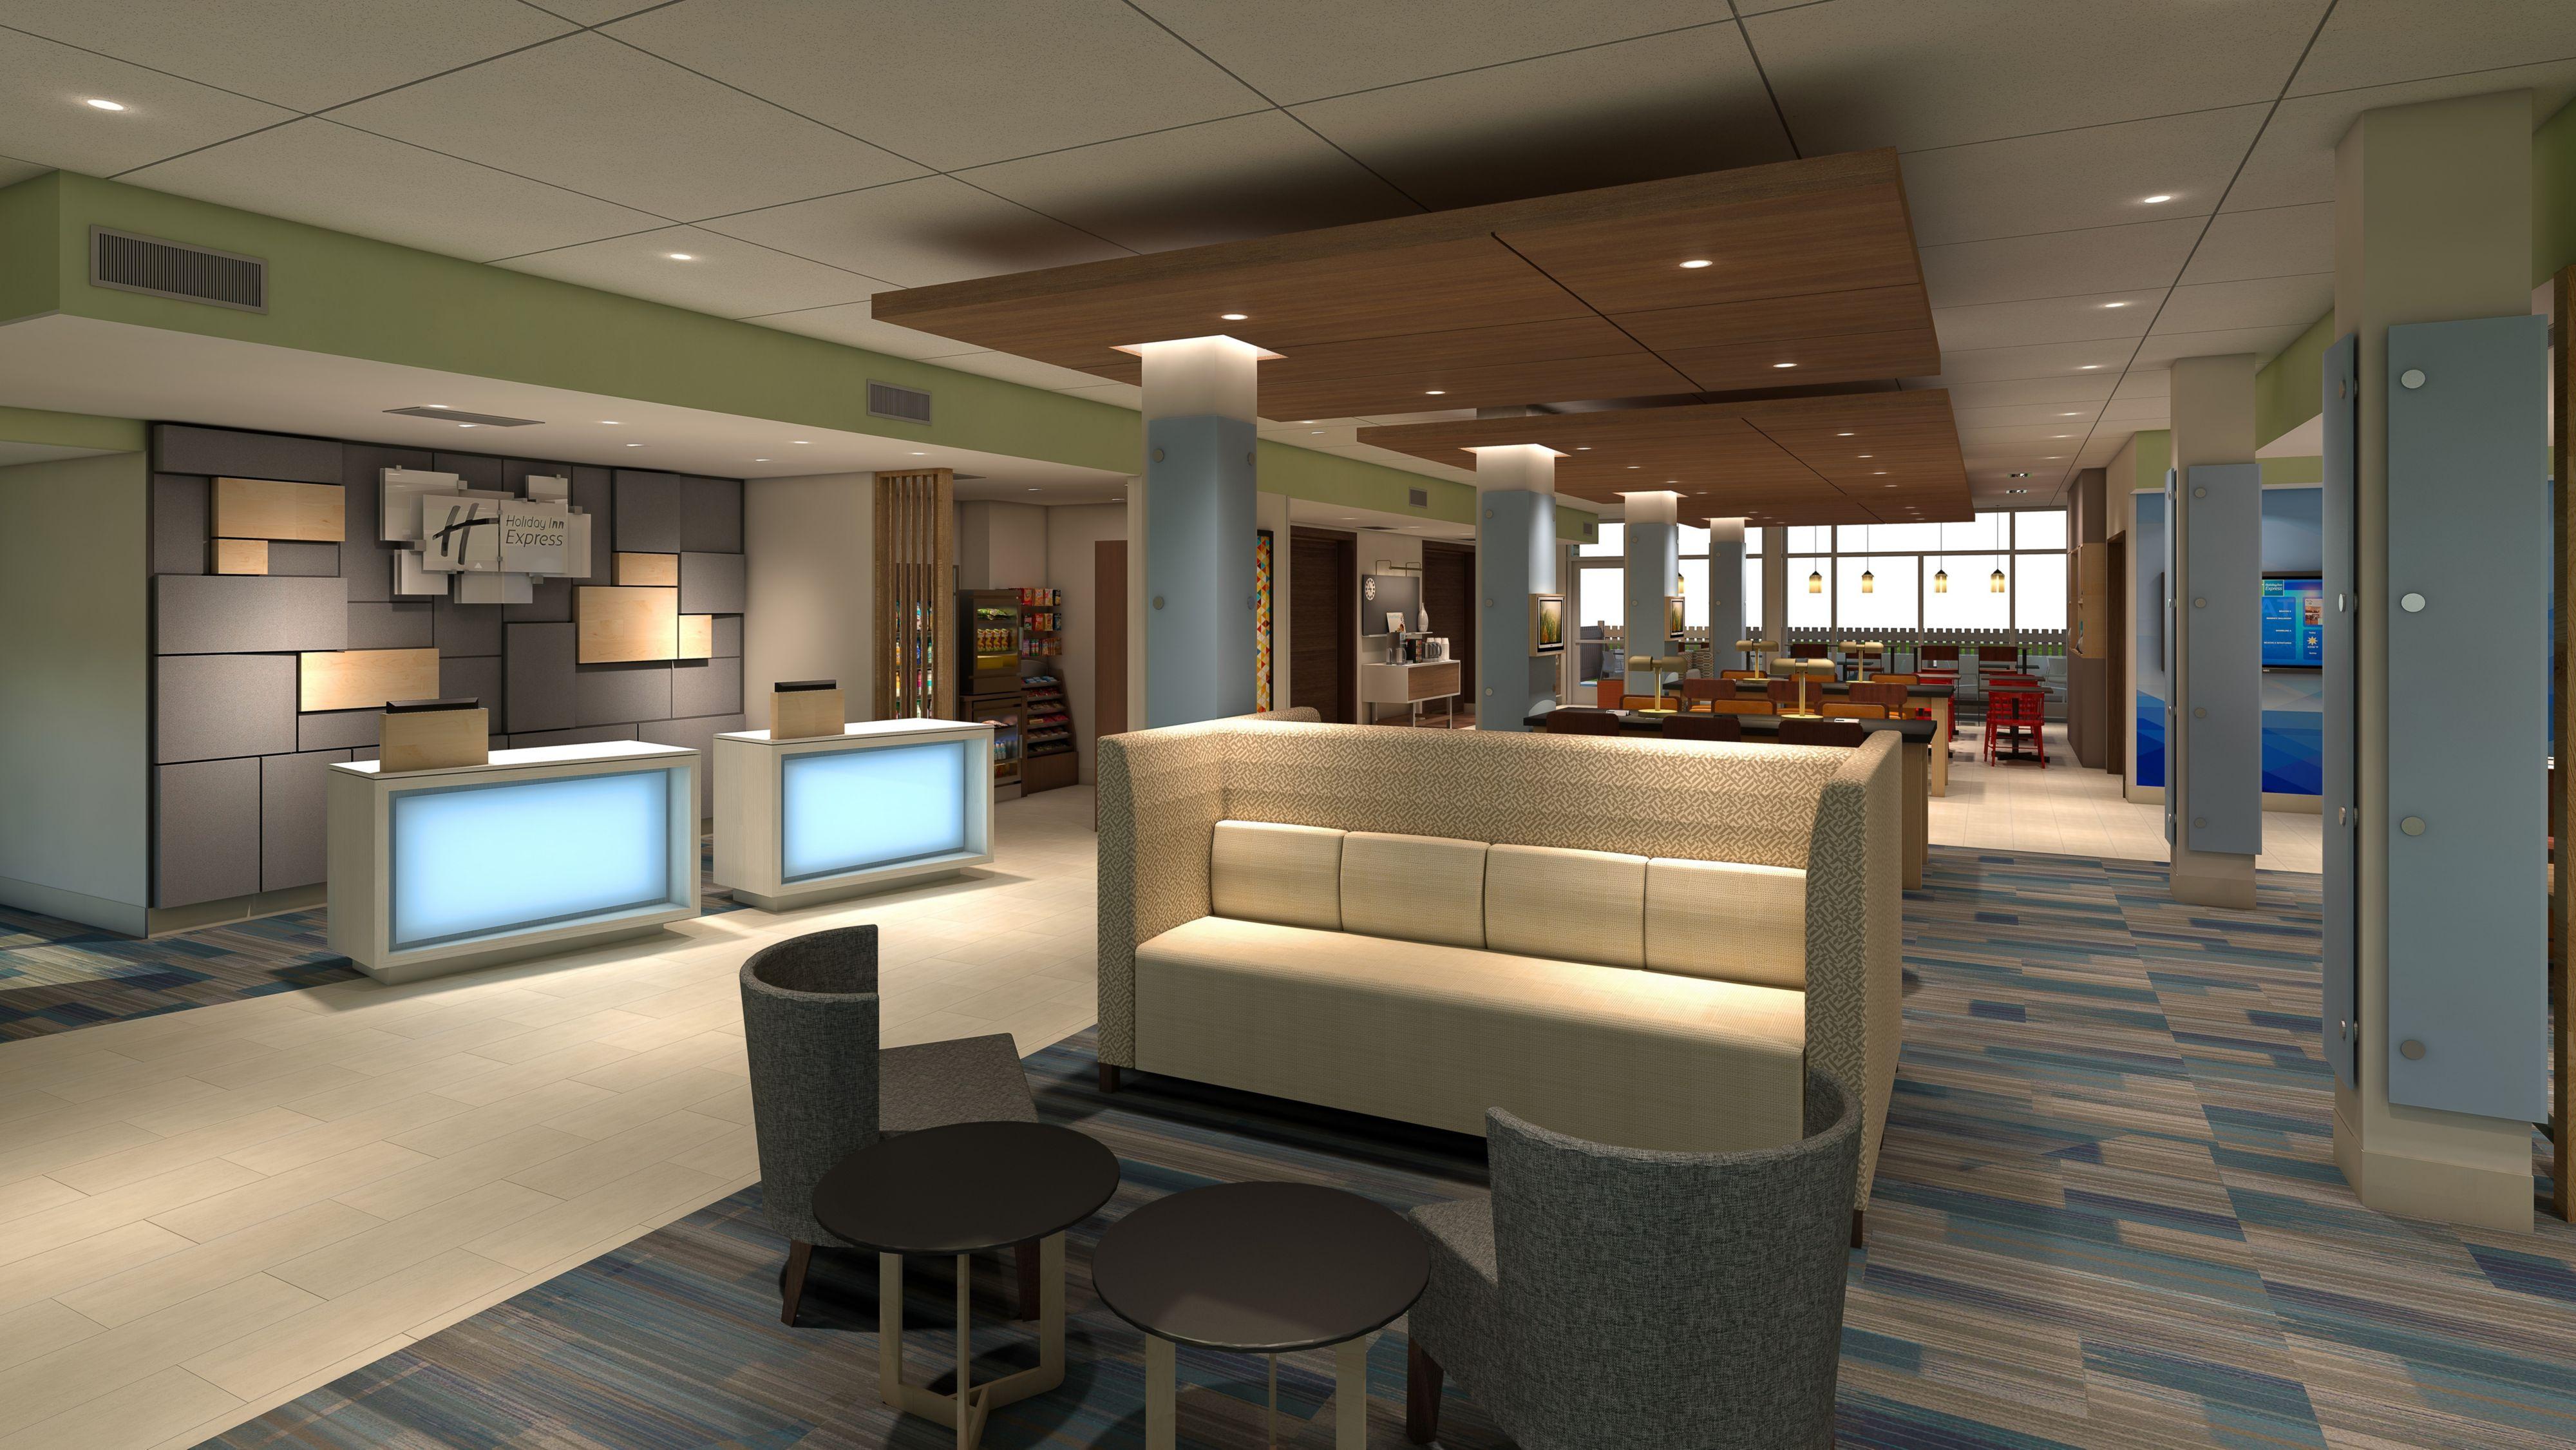 Holiday Inn Express Donaldsonville 2280 Business Park Blvd 225 473 3500